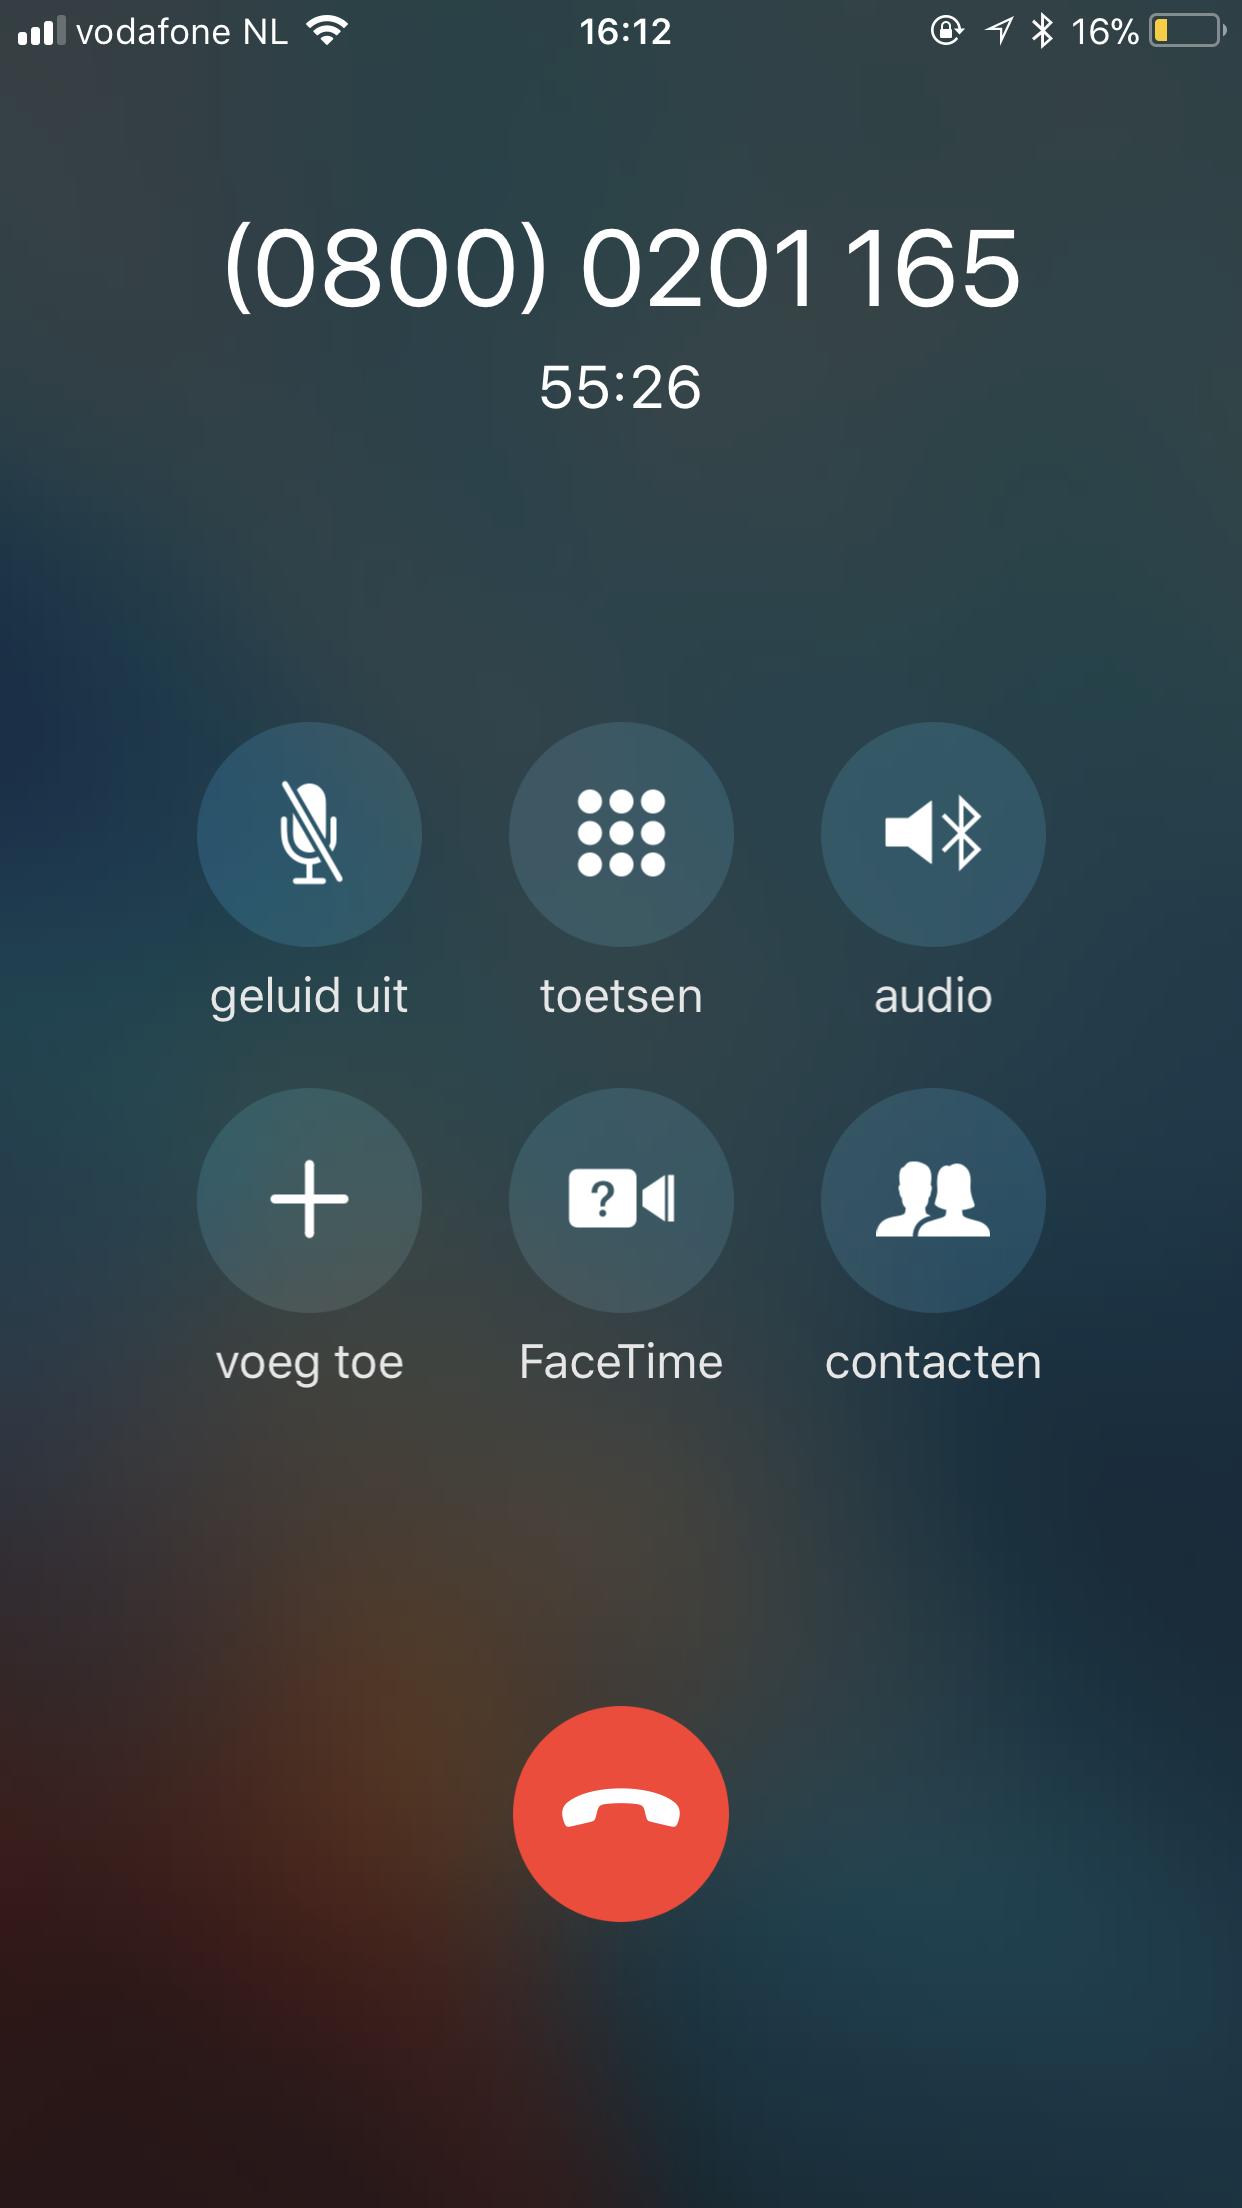 Storing Huawei E5186 na update firmware    | KPN Community